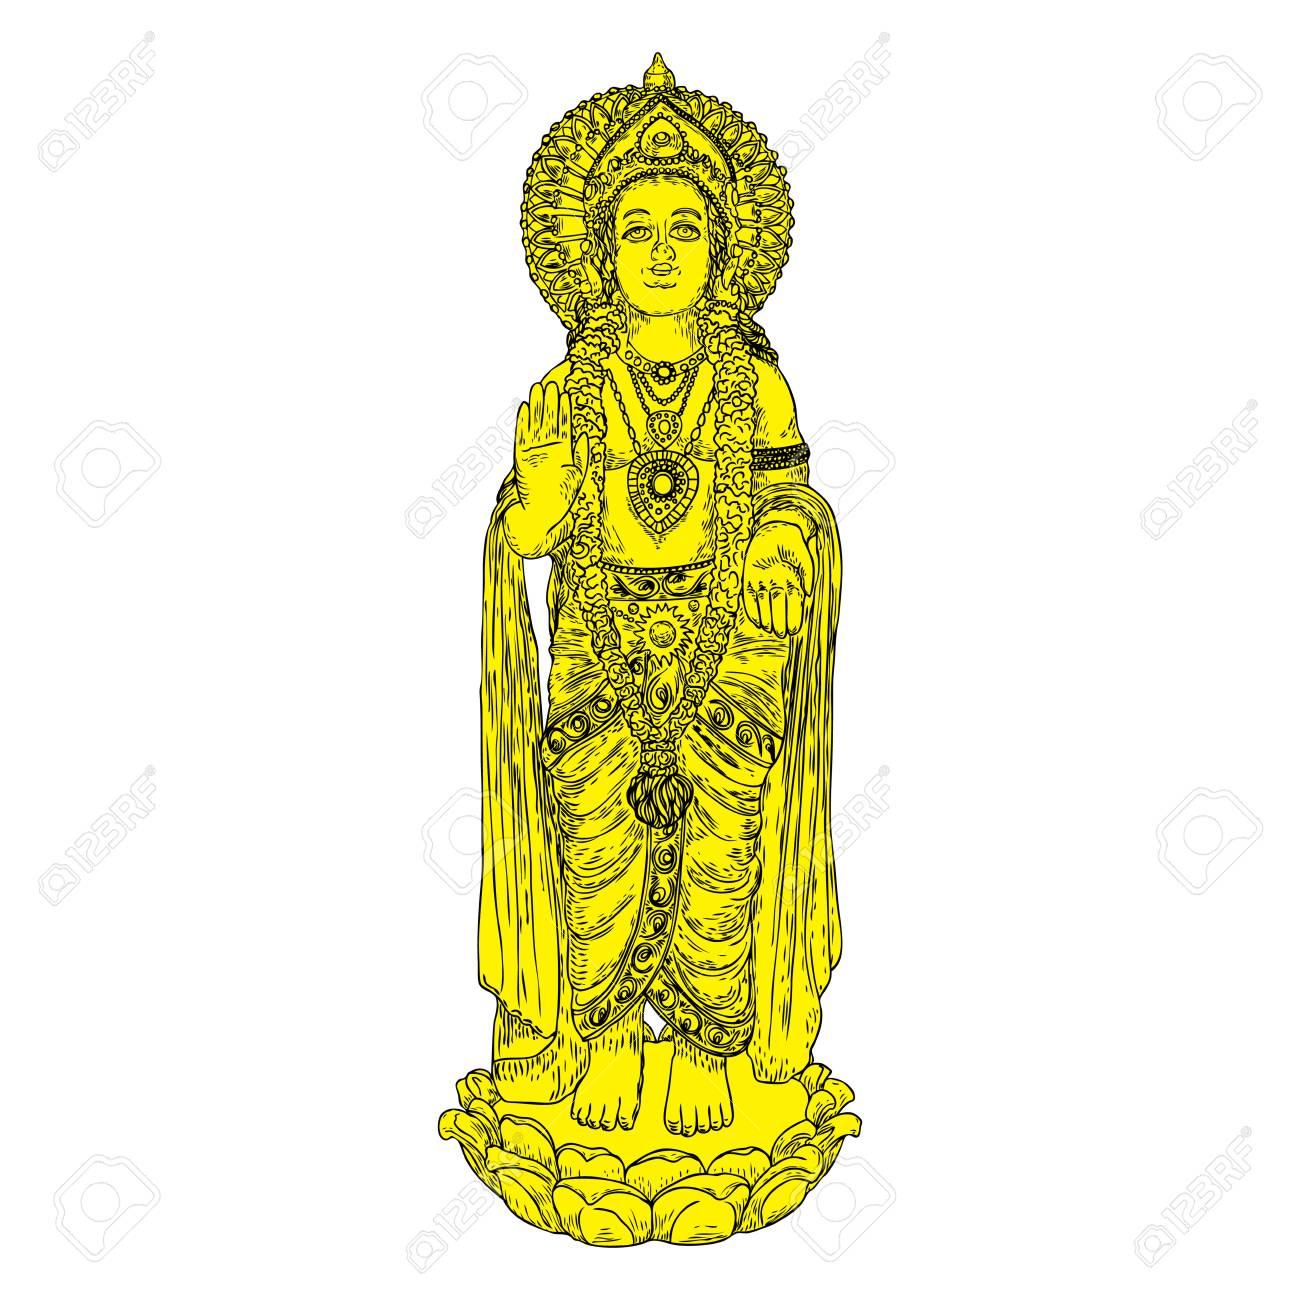 Lord Murugan Classic Statue Drawing God Of War Son Of Shiva